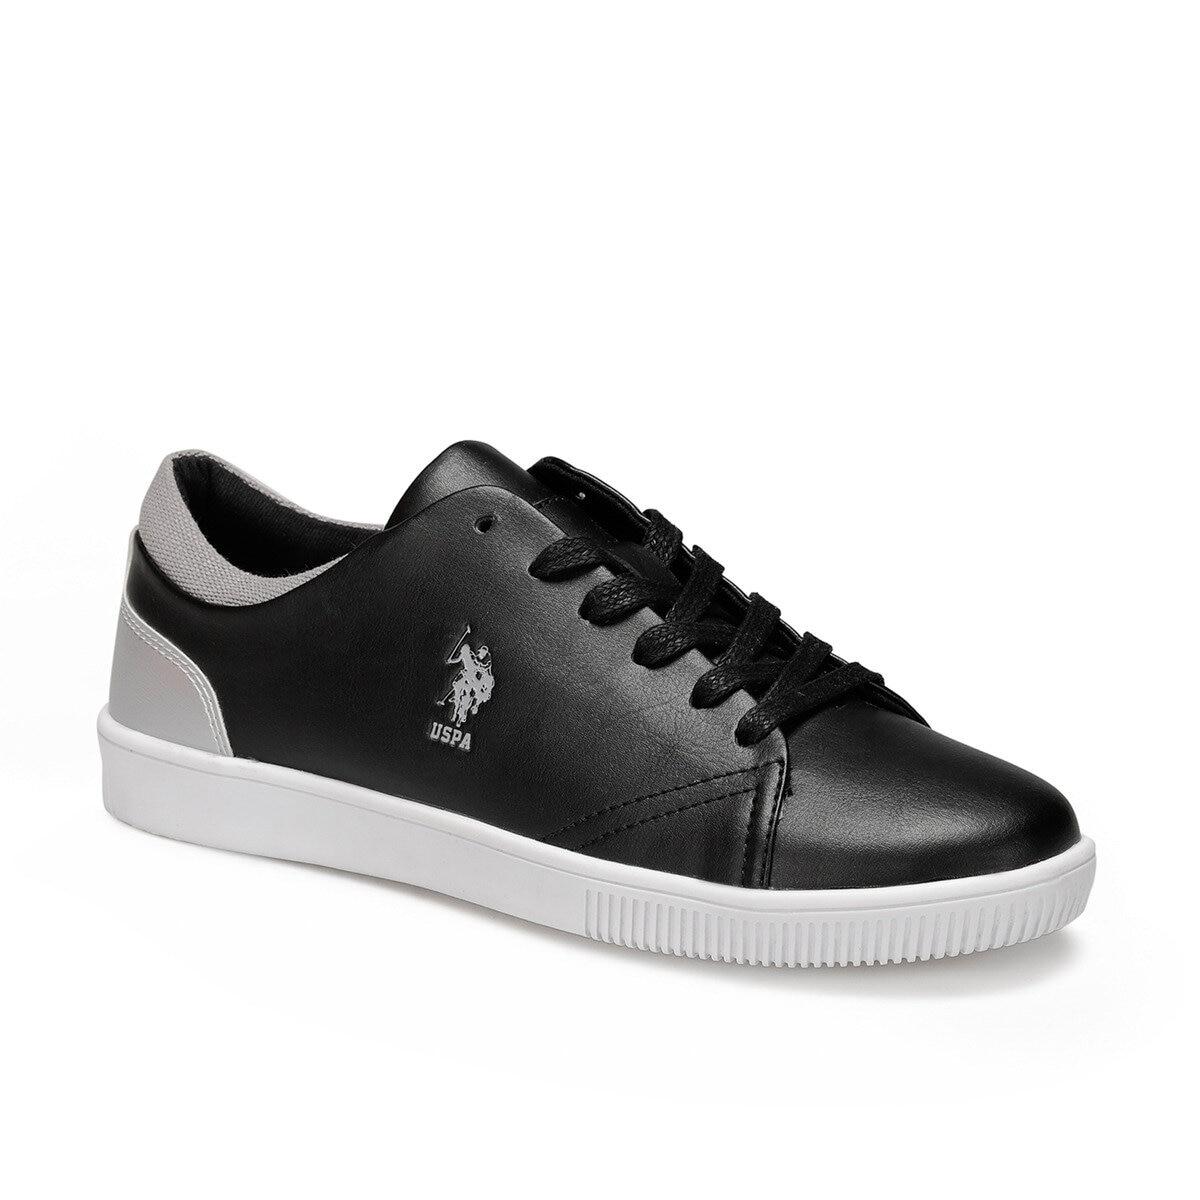 FLO REST Black Women Basic Casual Shoes U.S. POLO ASSN.